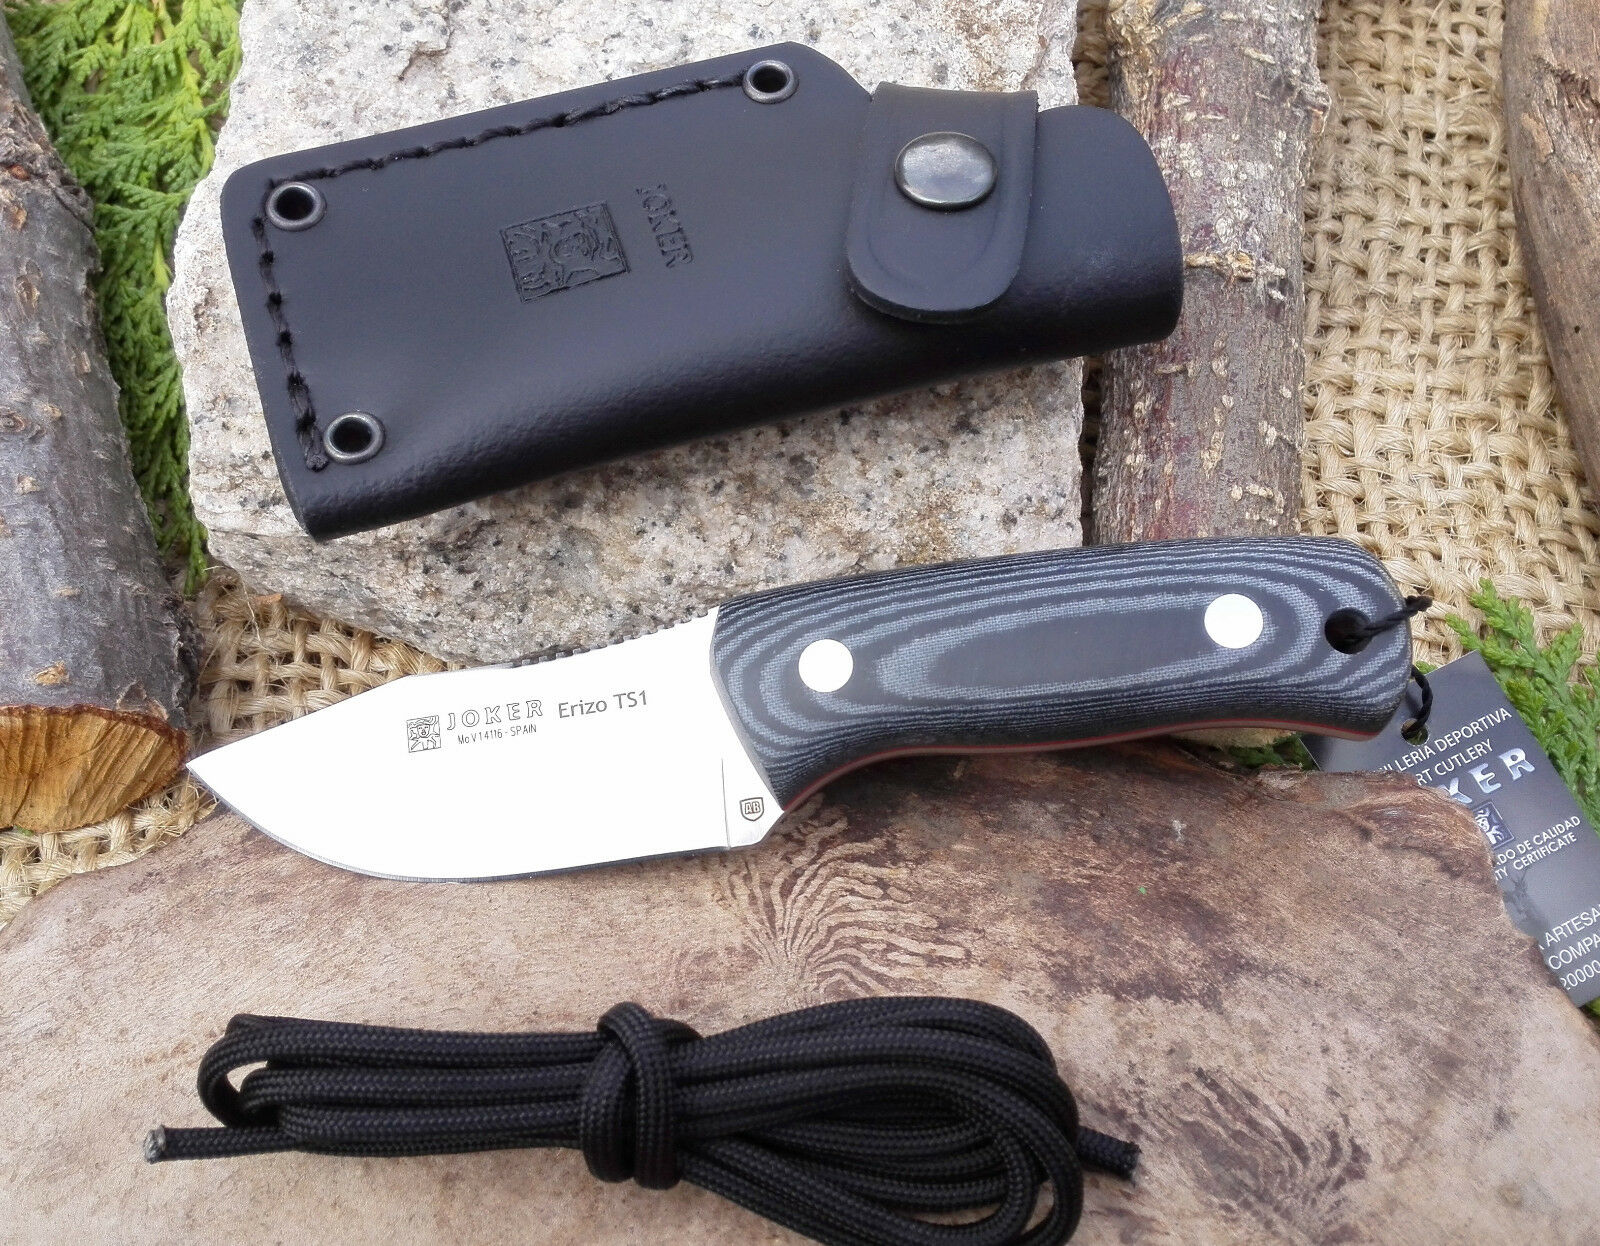 Cuchillo JOKER ERIZO ERIZO ERIZO TS1 CM81 Hoja 7,5 cm Acero Mova 1.4116 KNIFE MESSER COUTEAU bf5018